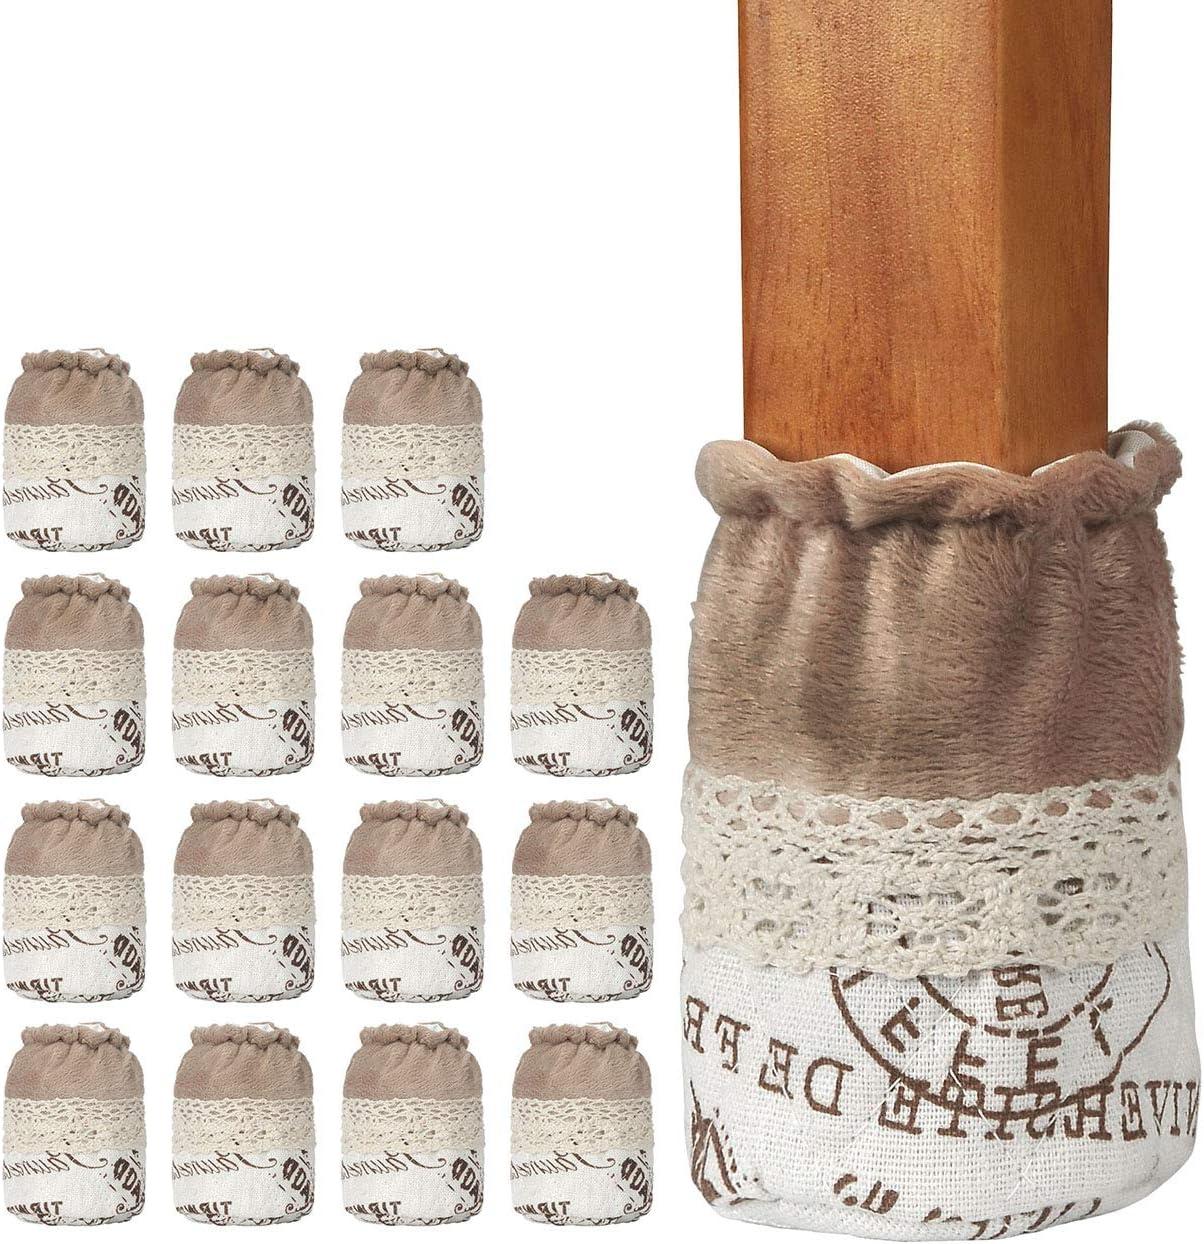 Chair Leg Socks, WarmHut 16pcs Table Furniture Leg Feet Tips Cloth Socks, Wood Floor Protectors, Home Decoration (Navajo Brown Letter)